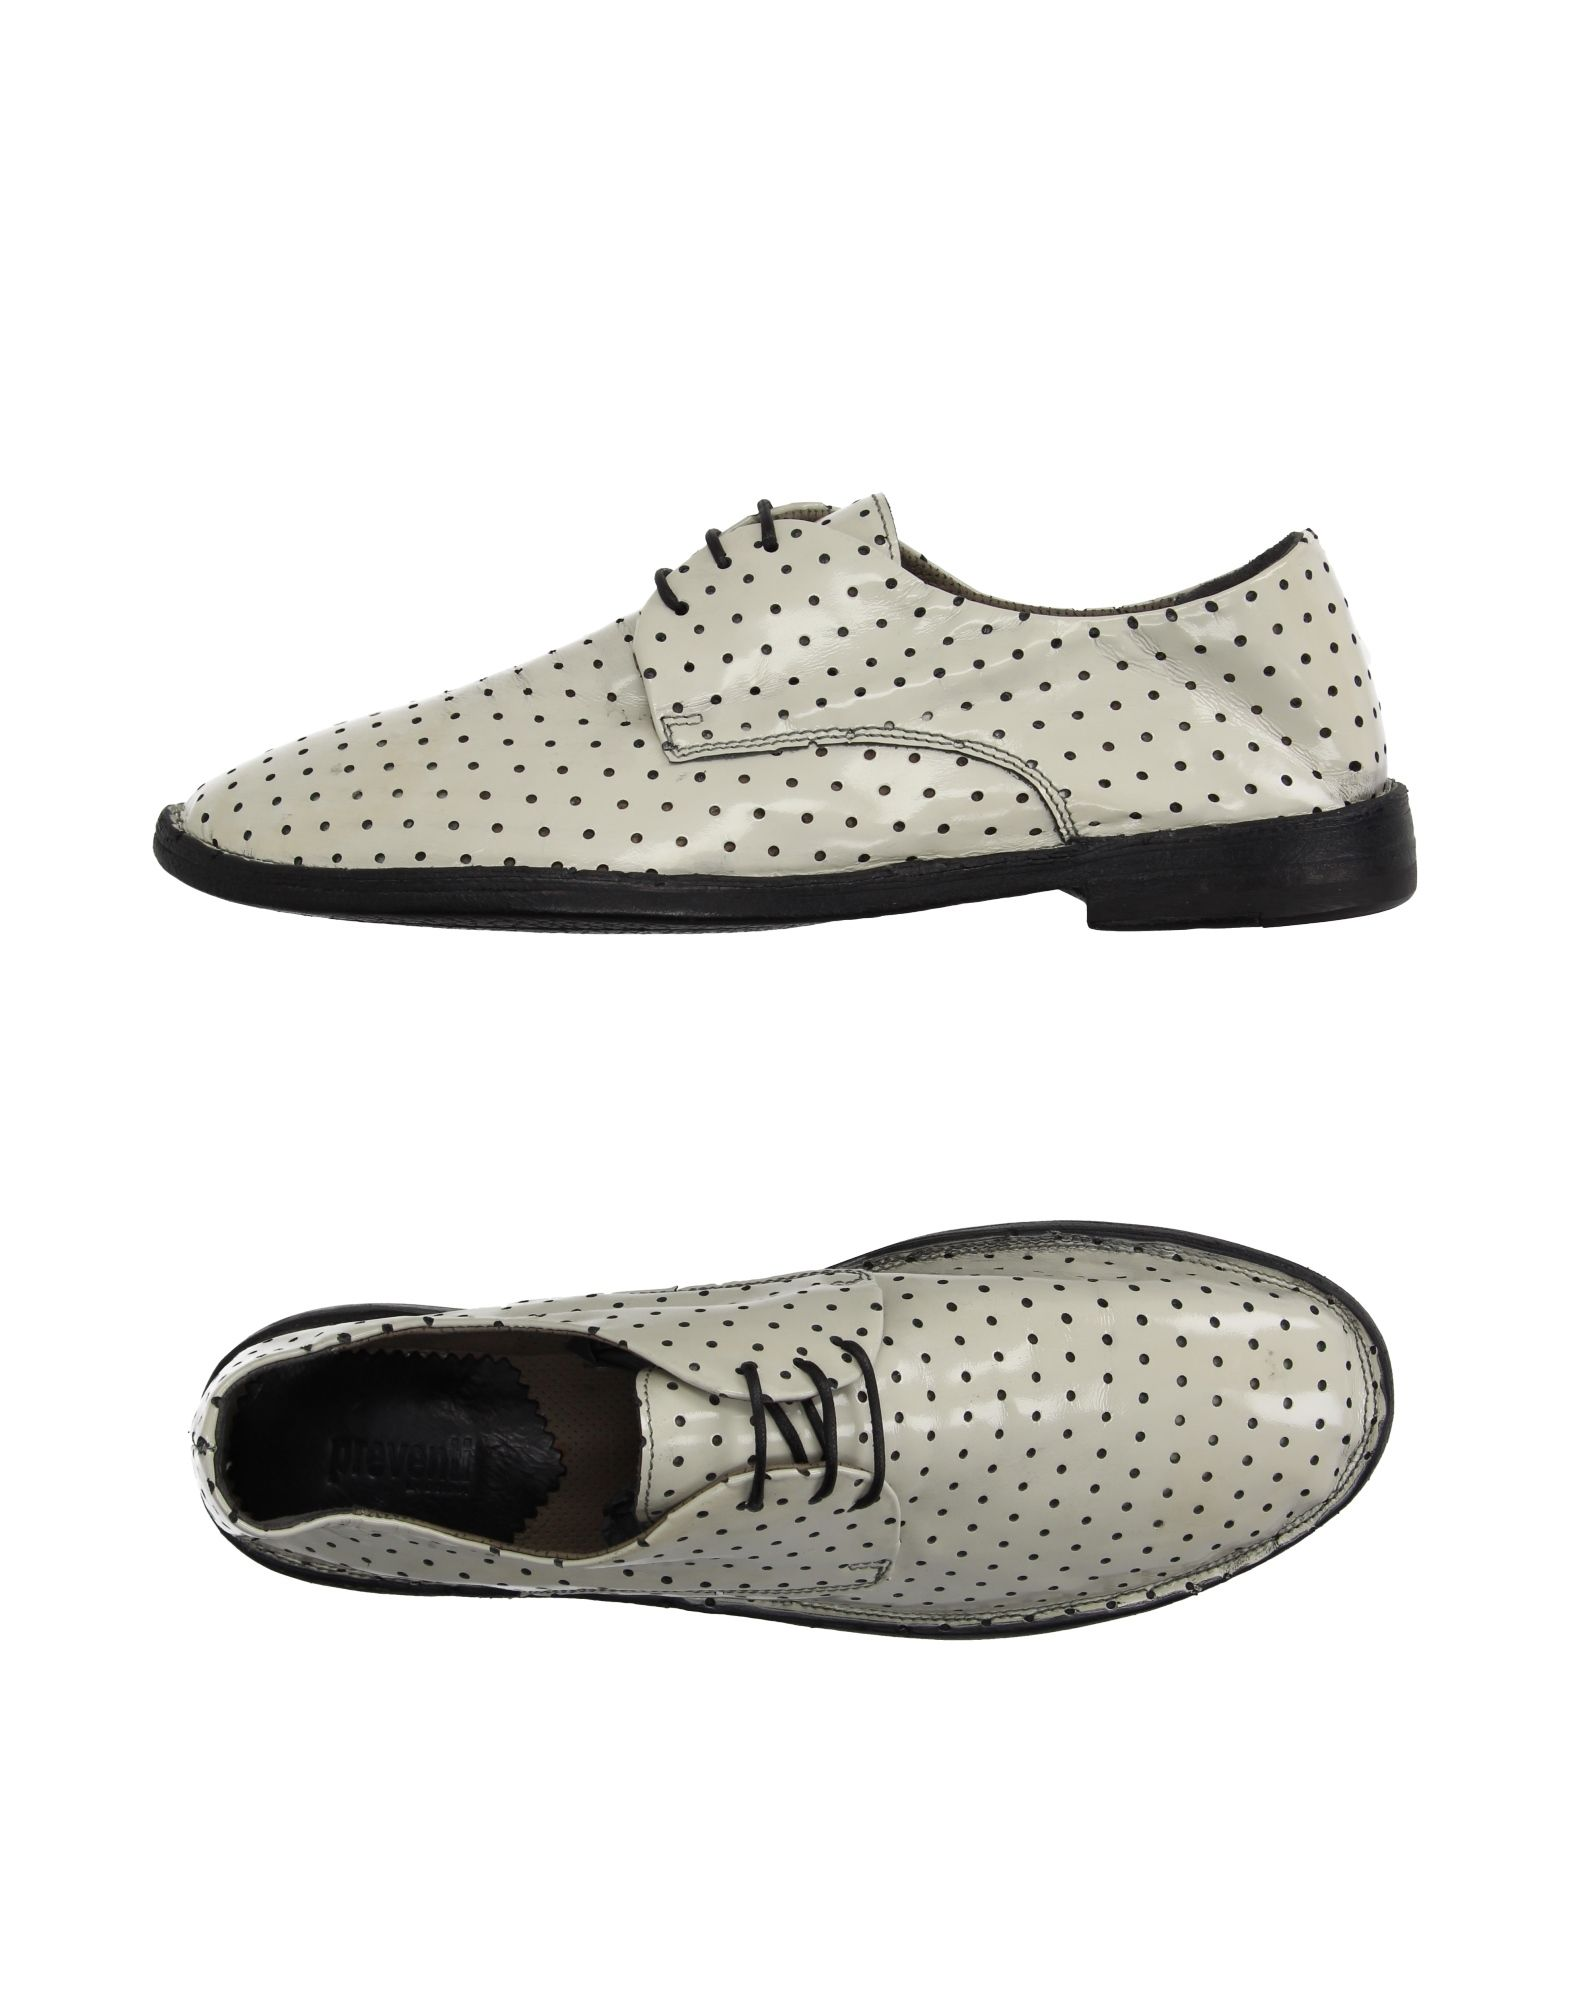 PREVENTI Обувь на шнурках сандалии ия 2017 круглый нос летняя обувь кожаная обувь обувь с пряжечной кожаная обувь